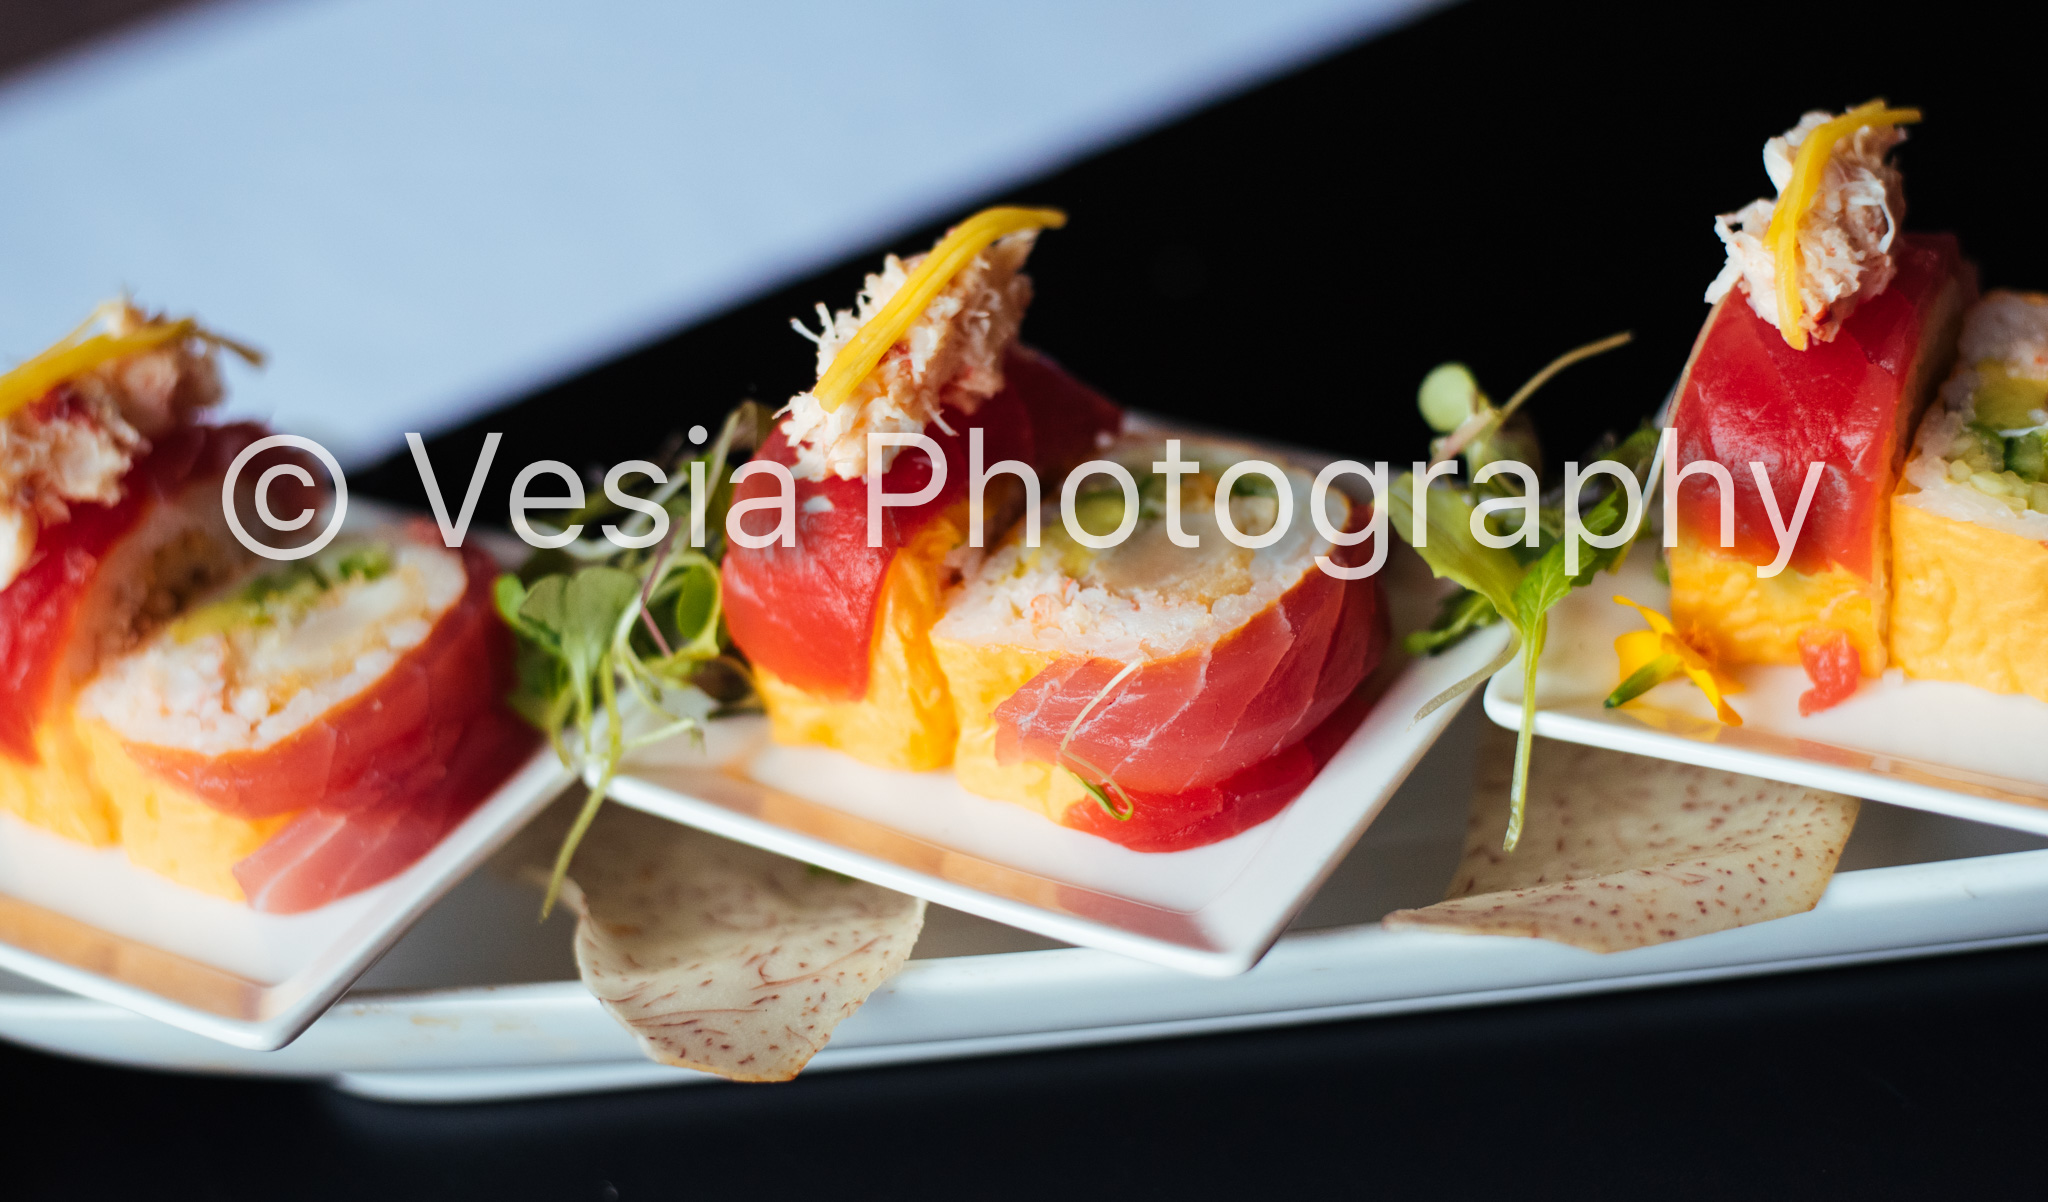 Caviar_Sushi_Proofs-9.jpg